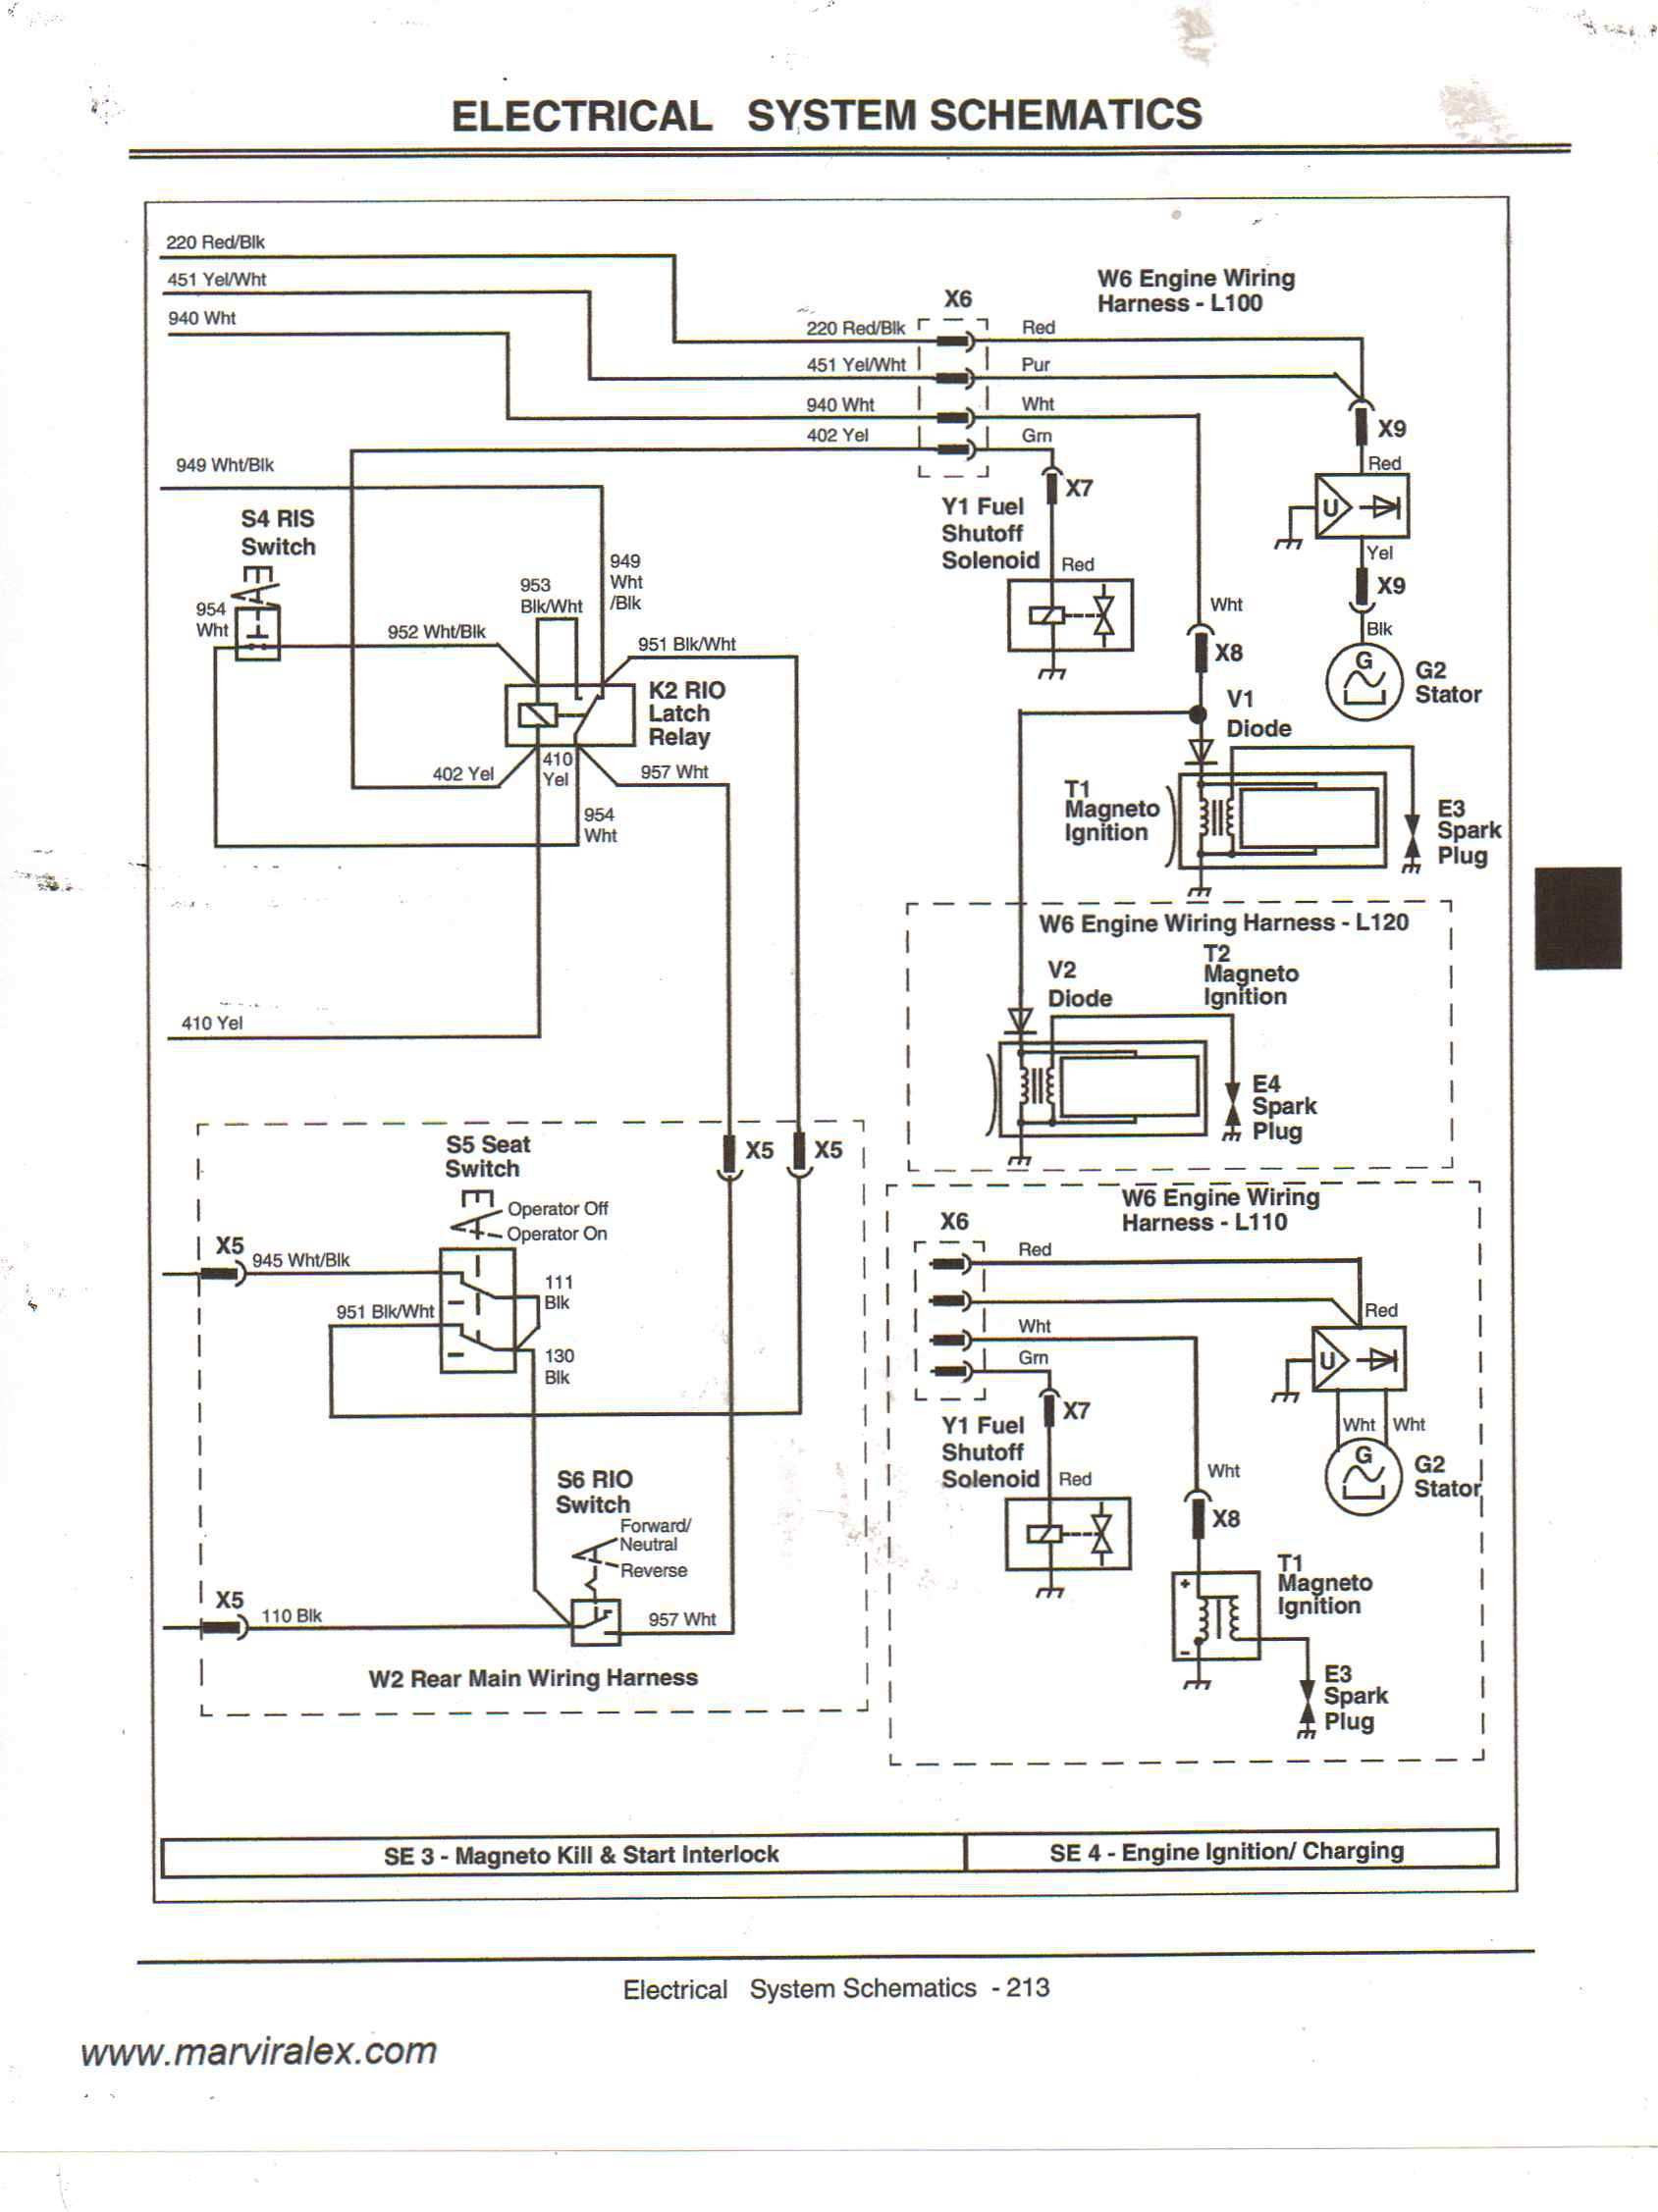 Pioneer Parking Brake Bypass Wiring Diagram Valid Pioneer Parking - Pioneer Parking Brake Bypass Wiring Diagram